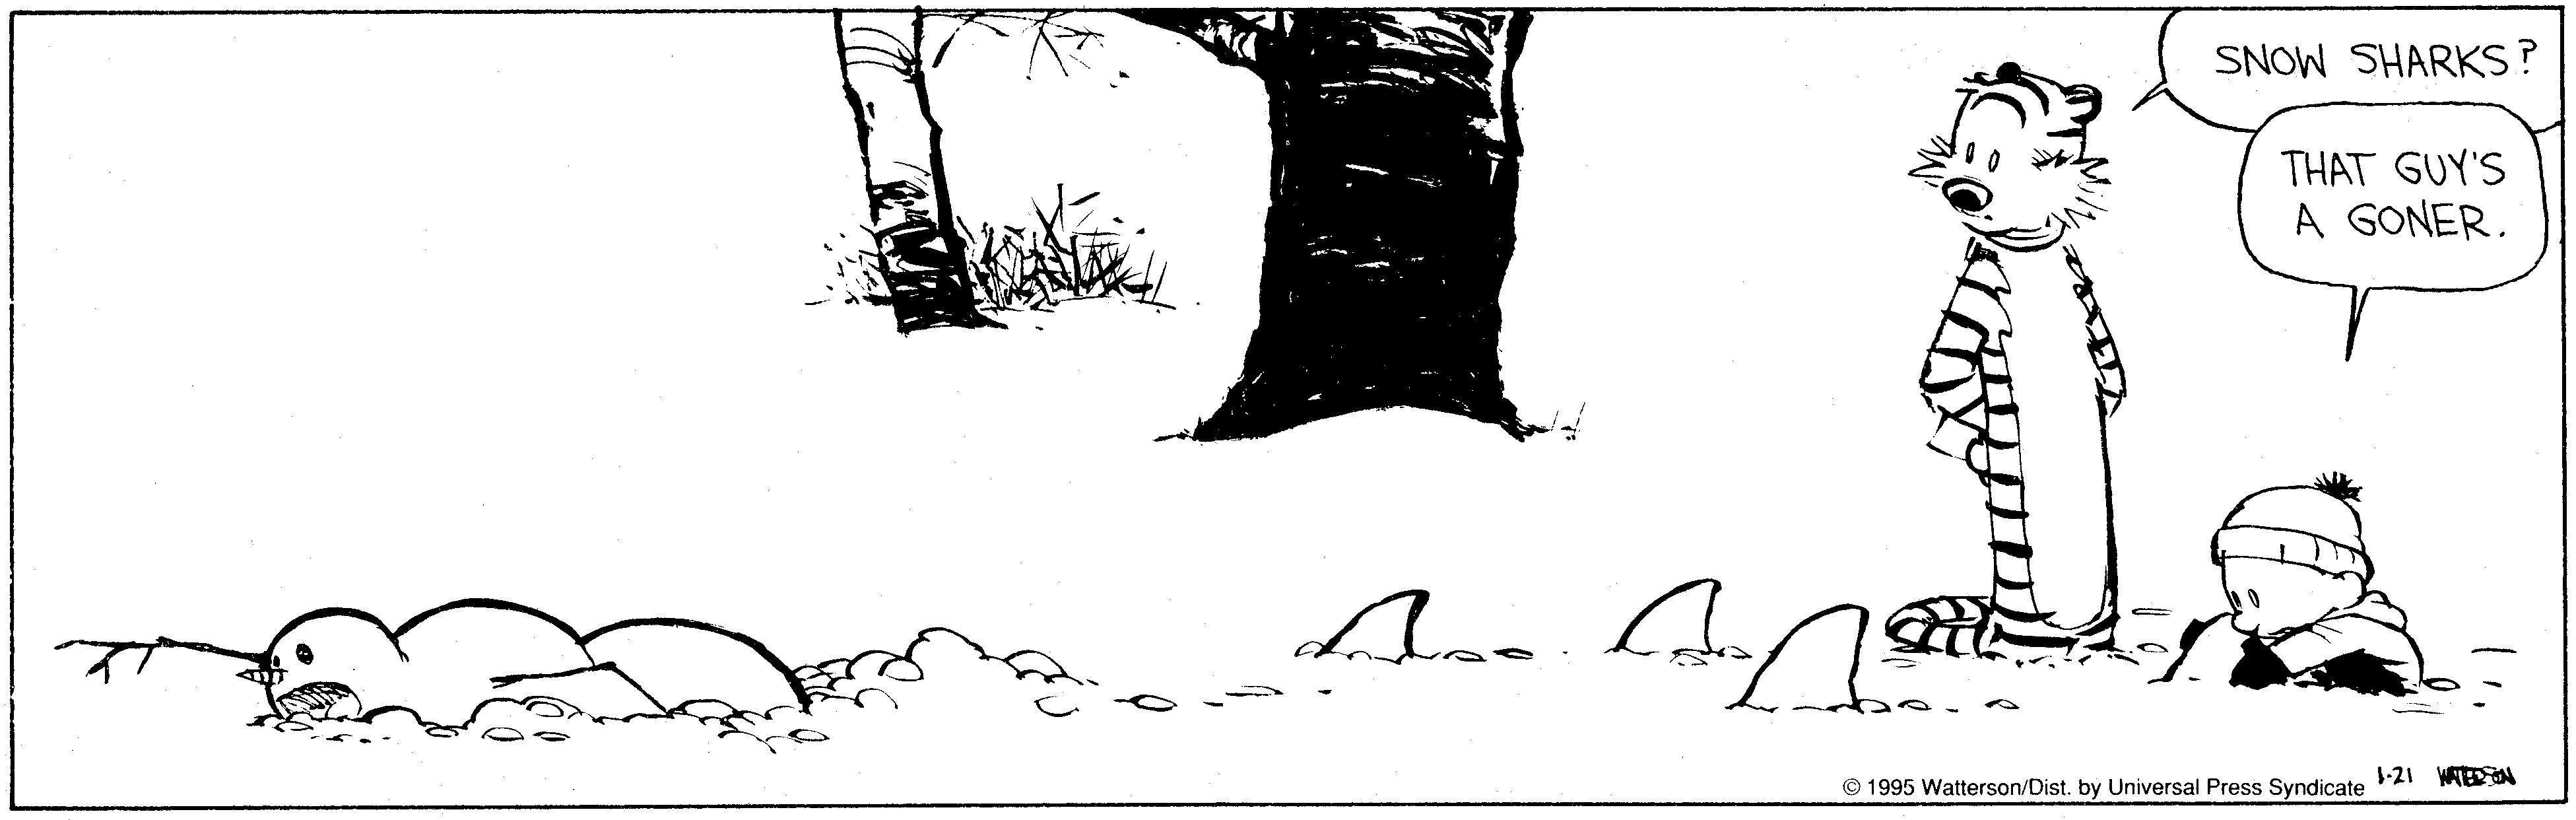 existentialism in bill wattersons comic strips essay